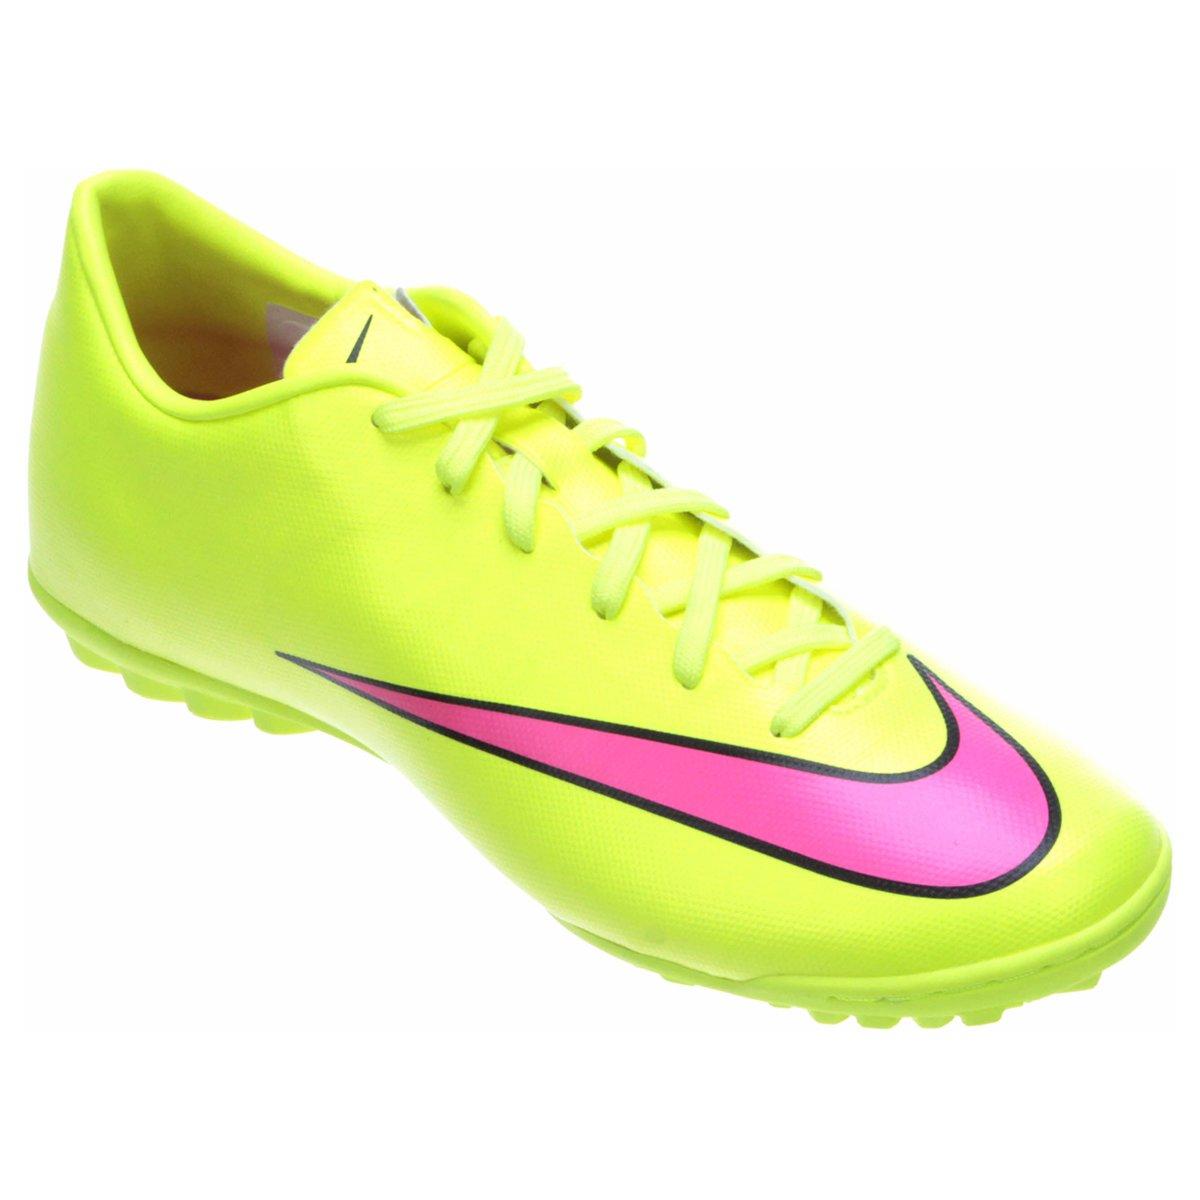 064cf1ae92 Chuteira Society Nike Mercurial Victory 5 TF